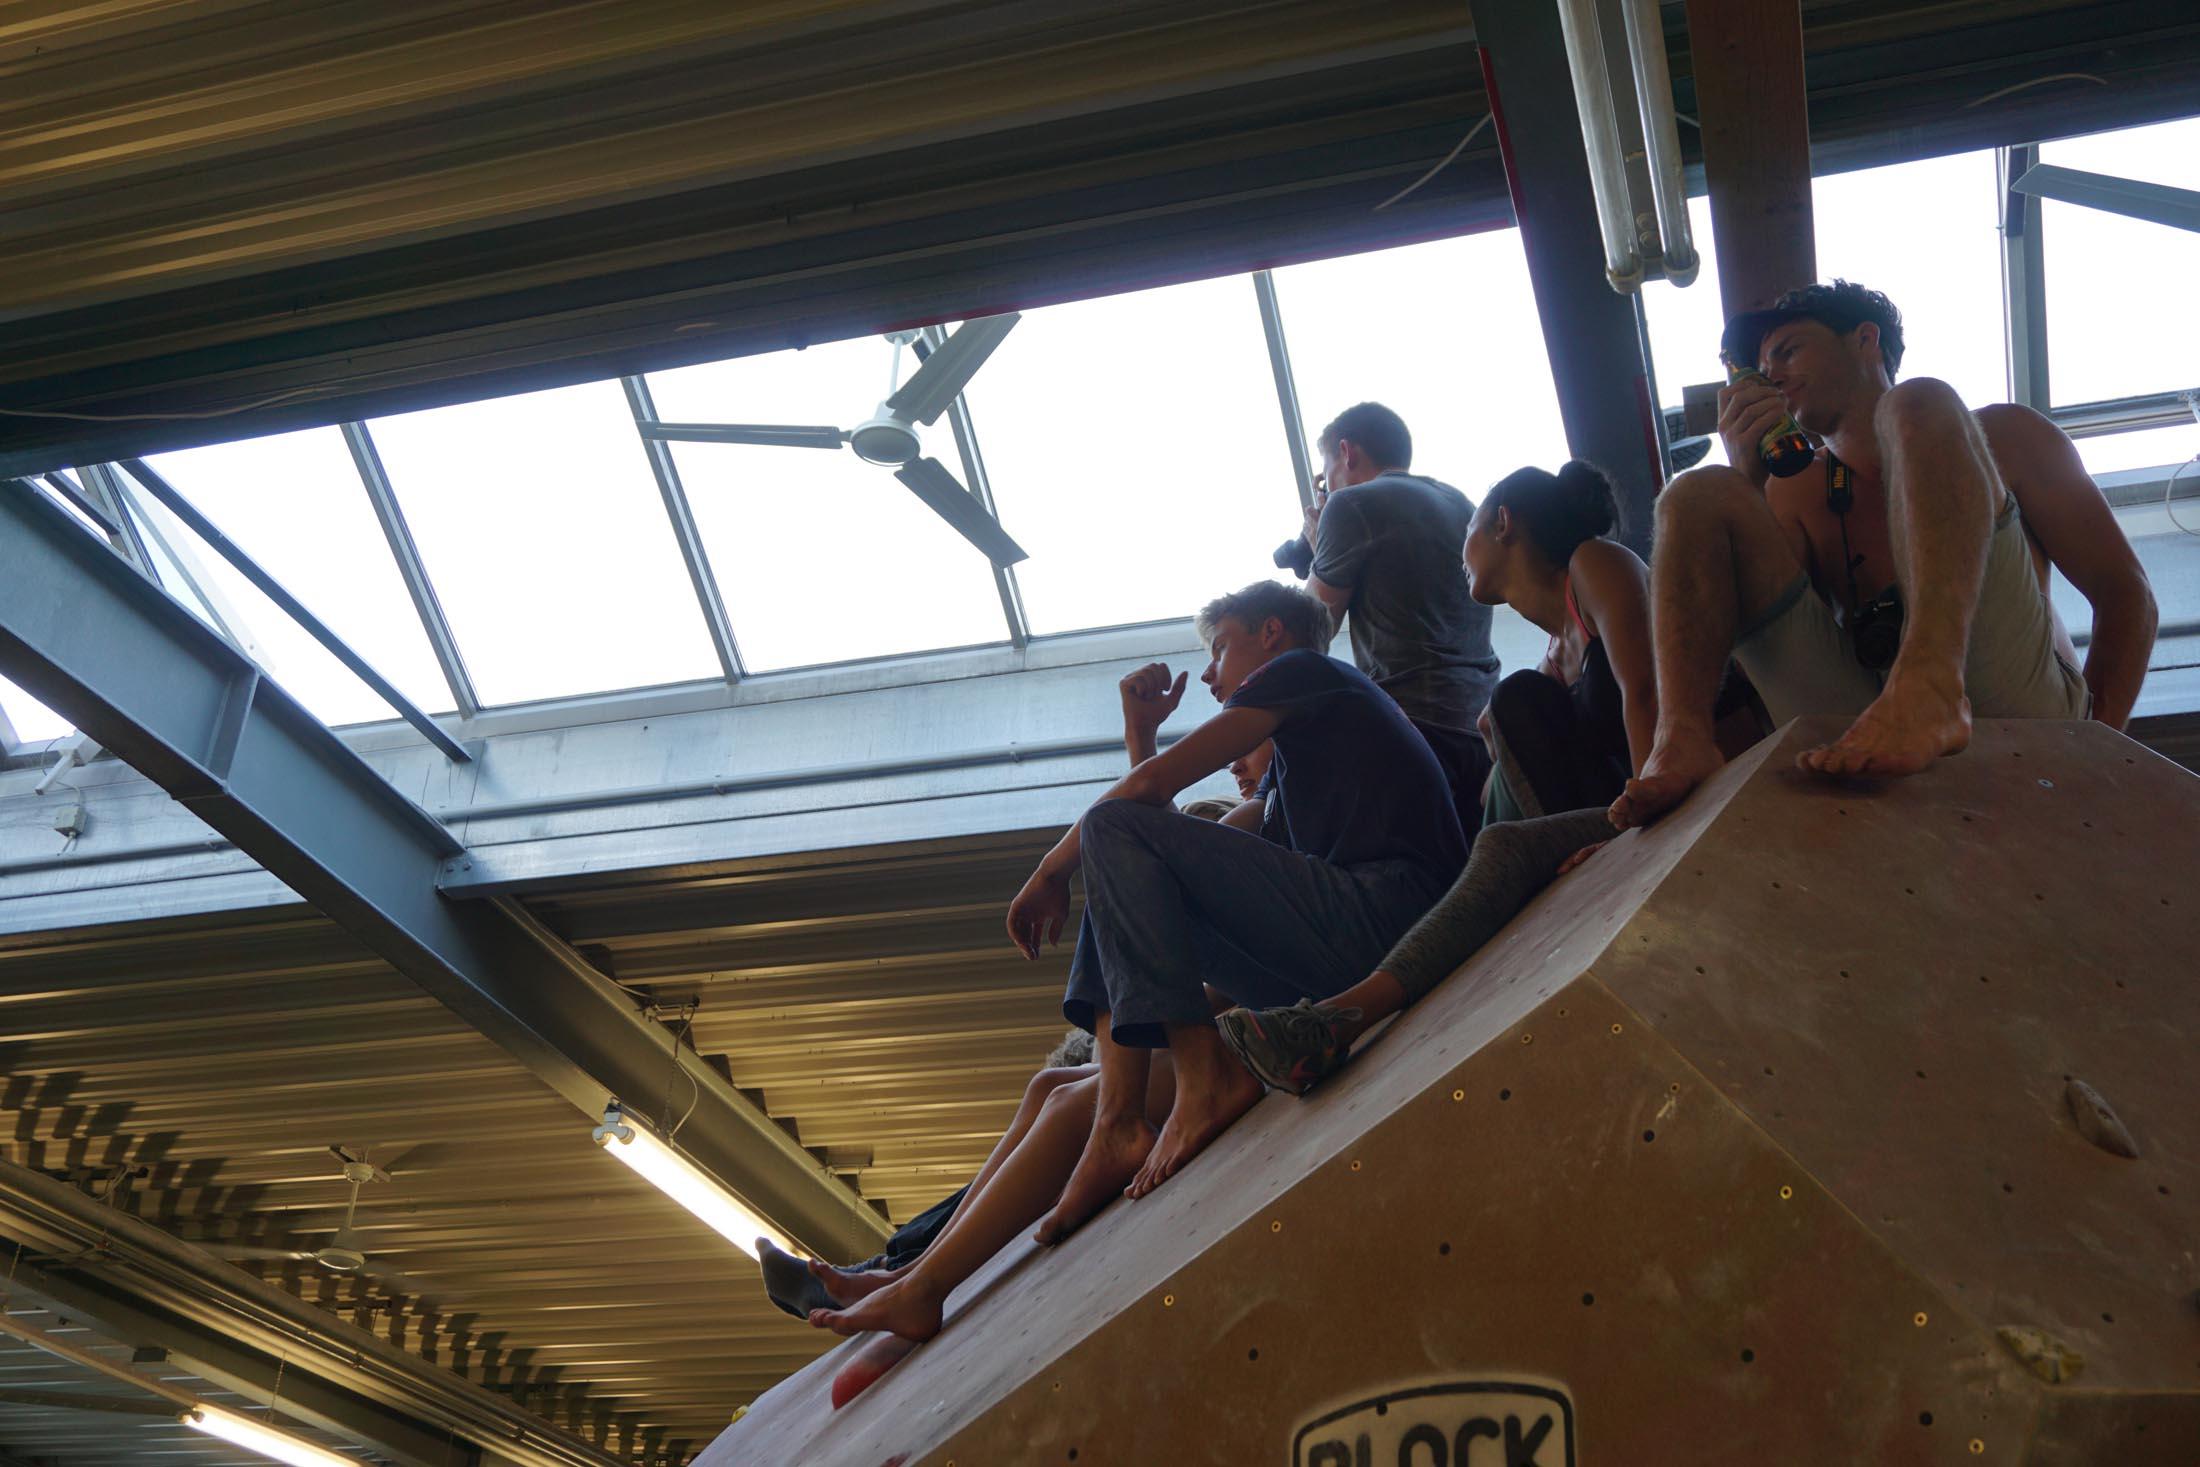 Finale, internationaler bouldercup Frankenjura 2016, BLOCKHELDEN Erlangen, Mammut, Bergfreunde.de, Boulderwettkampf07092016579